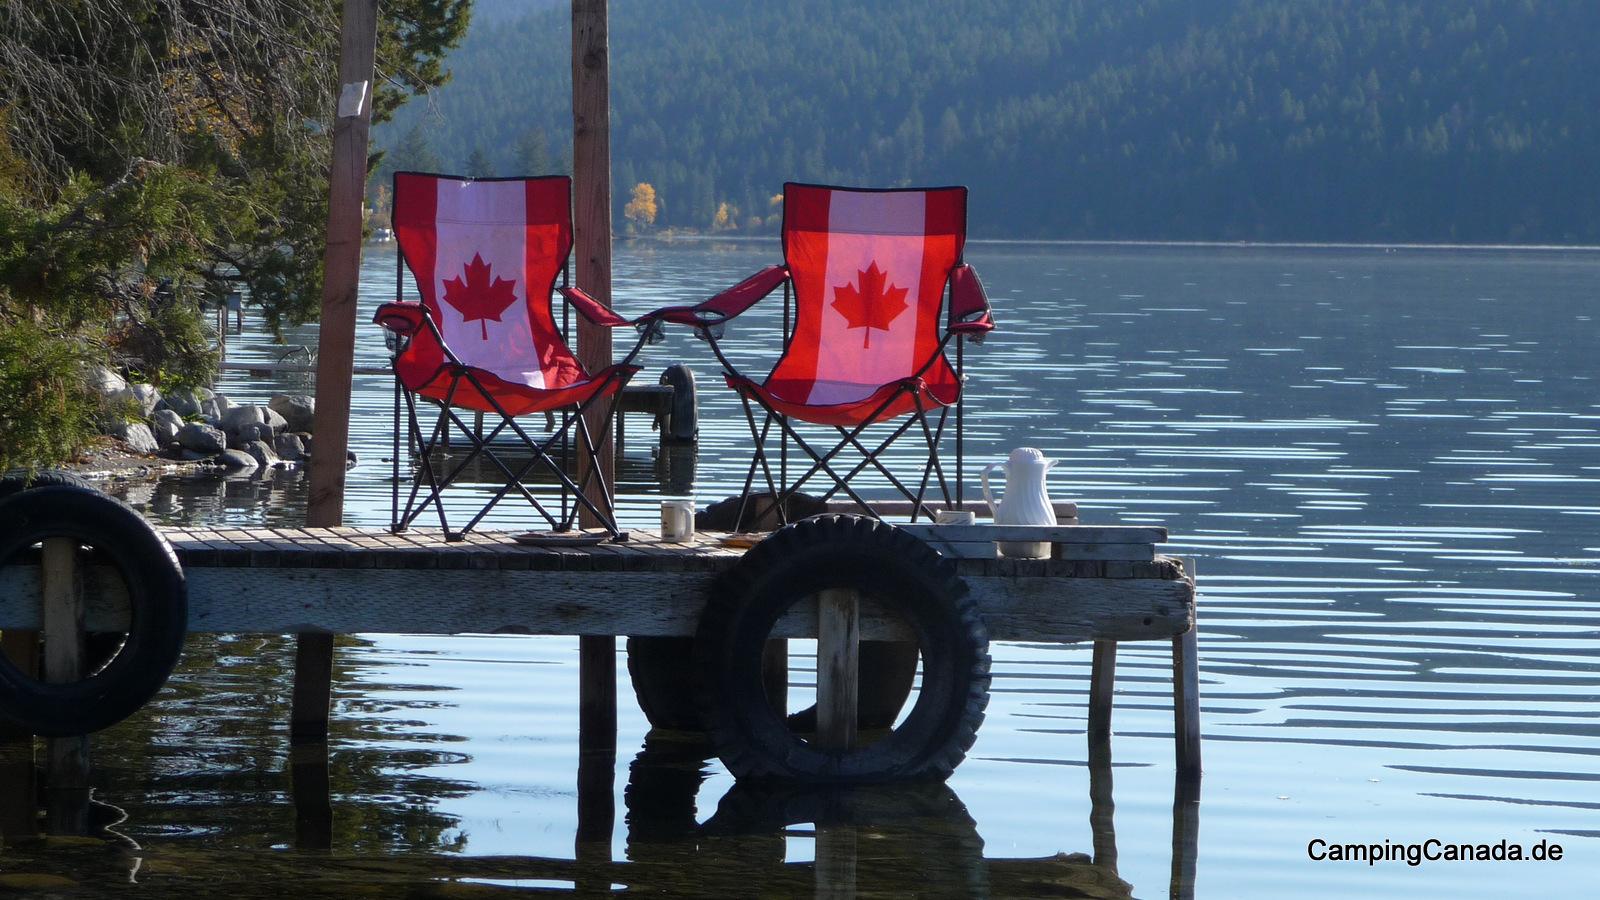 Campingstühle auf einem Steg am Loon Lake